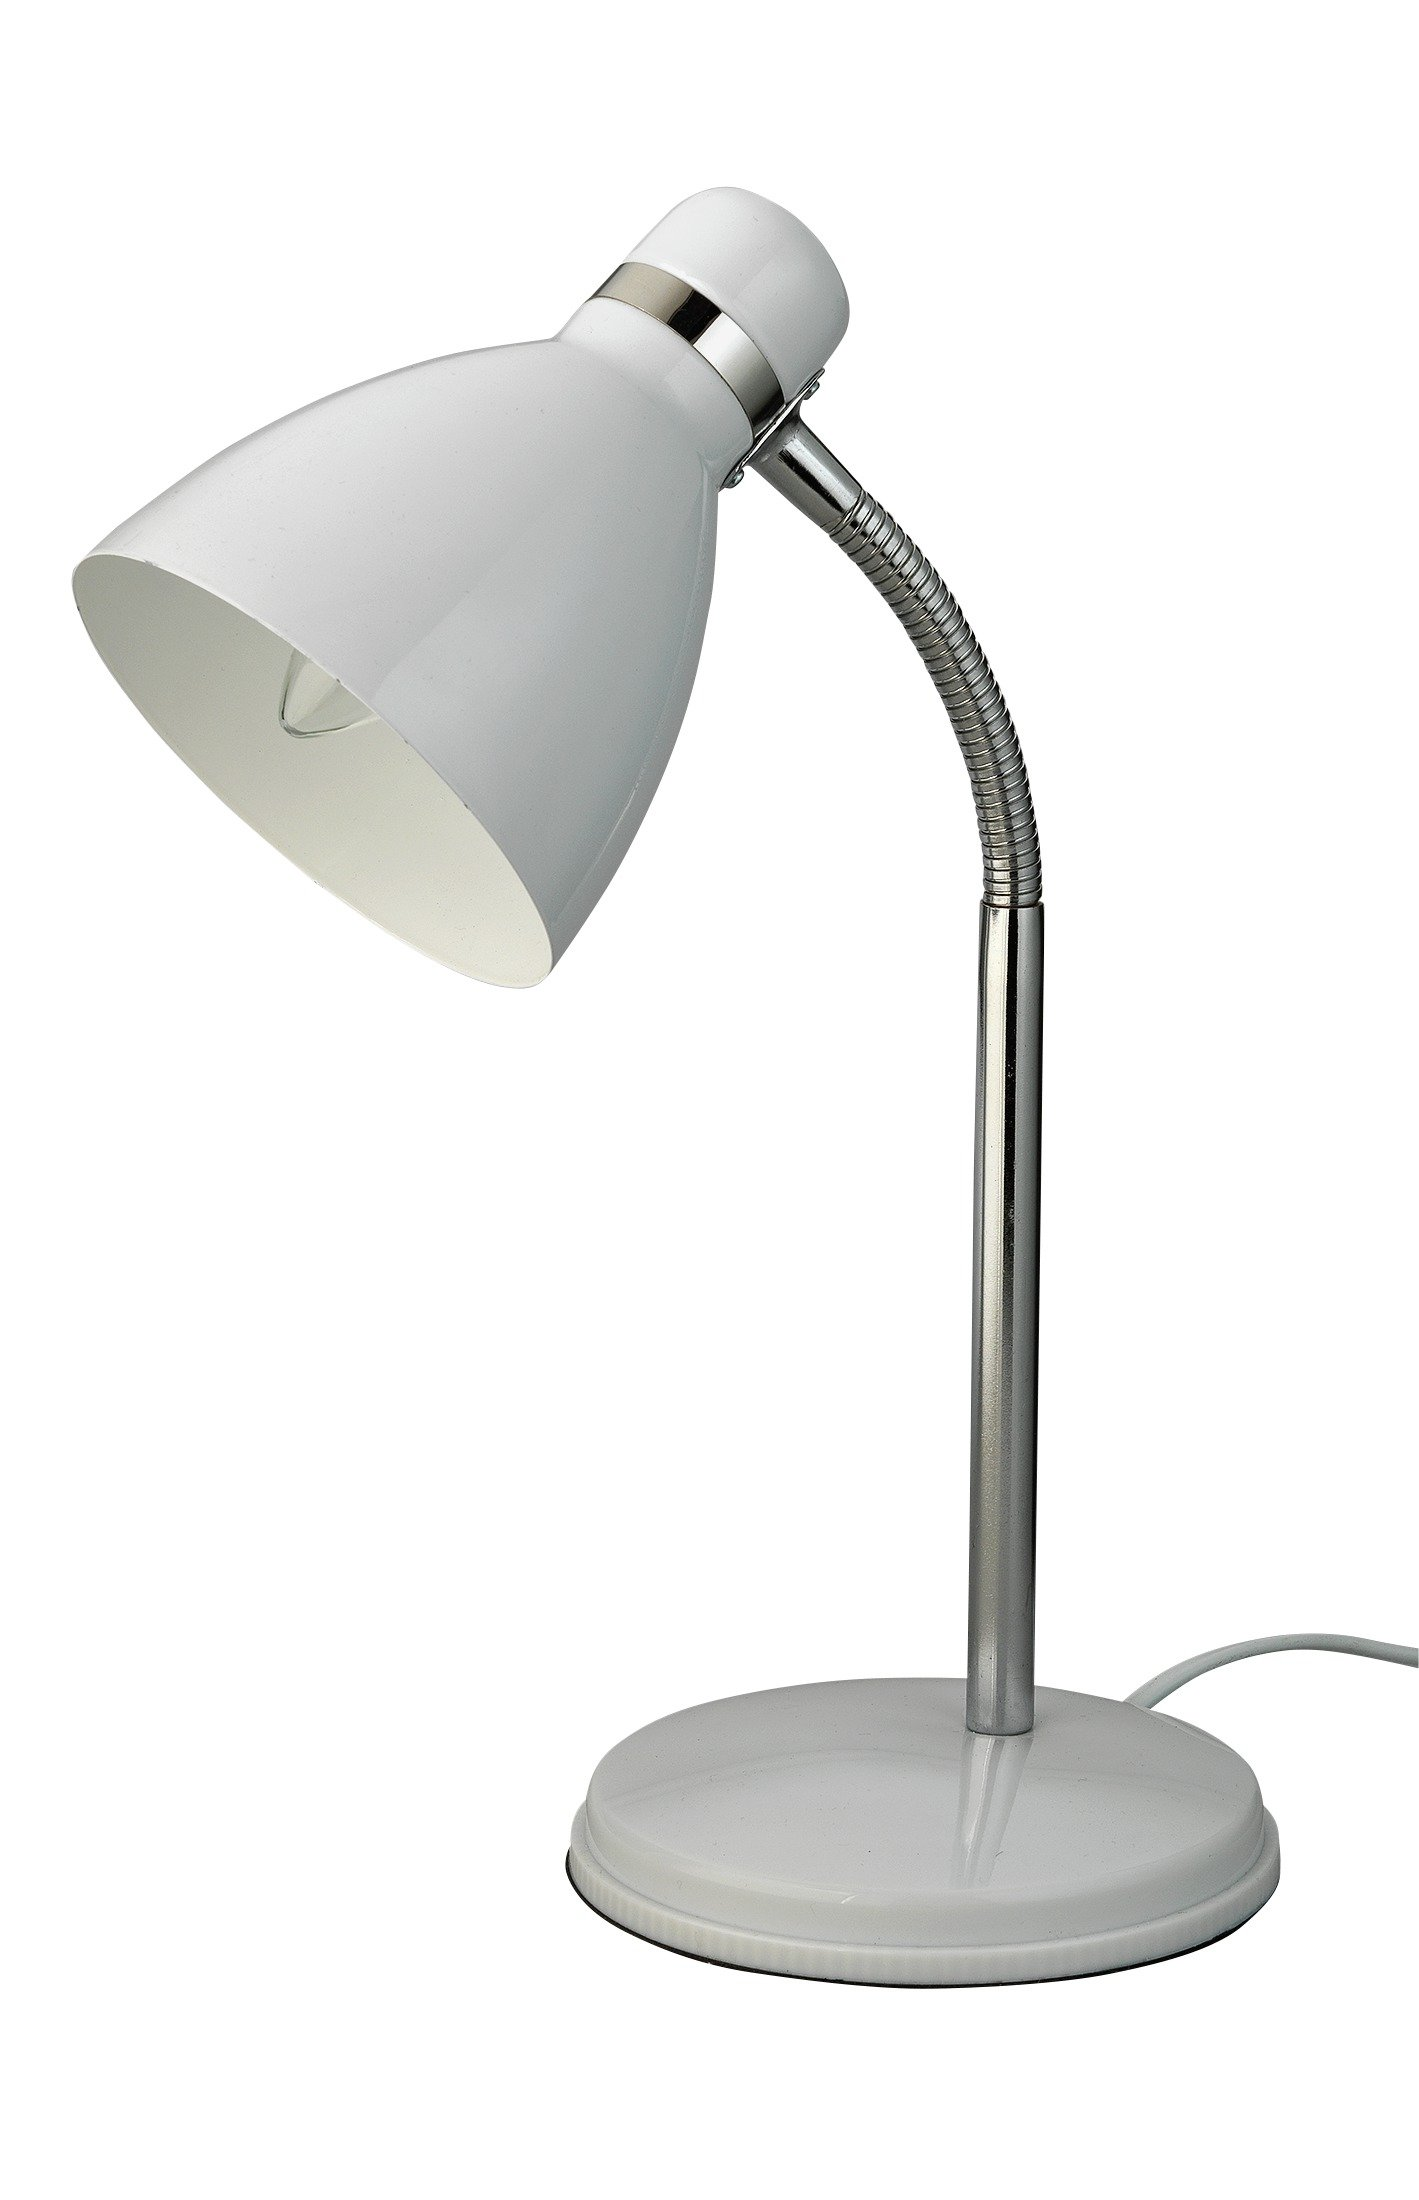 Argos Home Desk Lamp - Super White